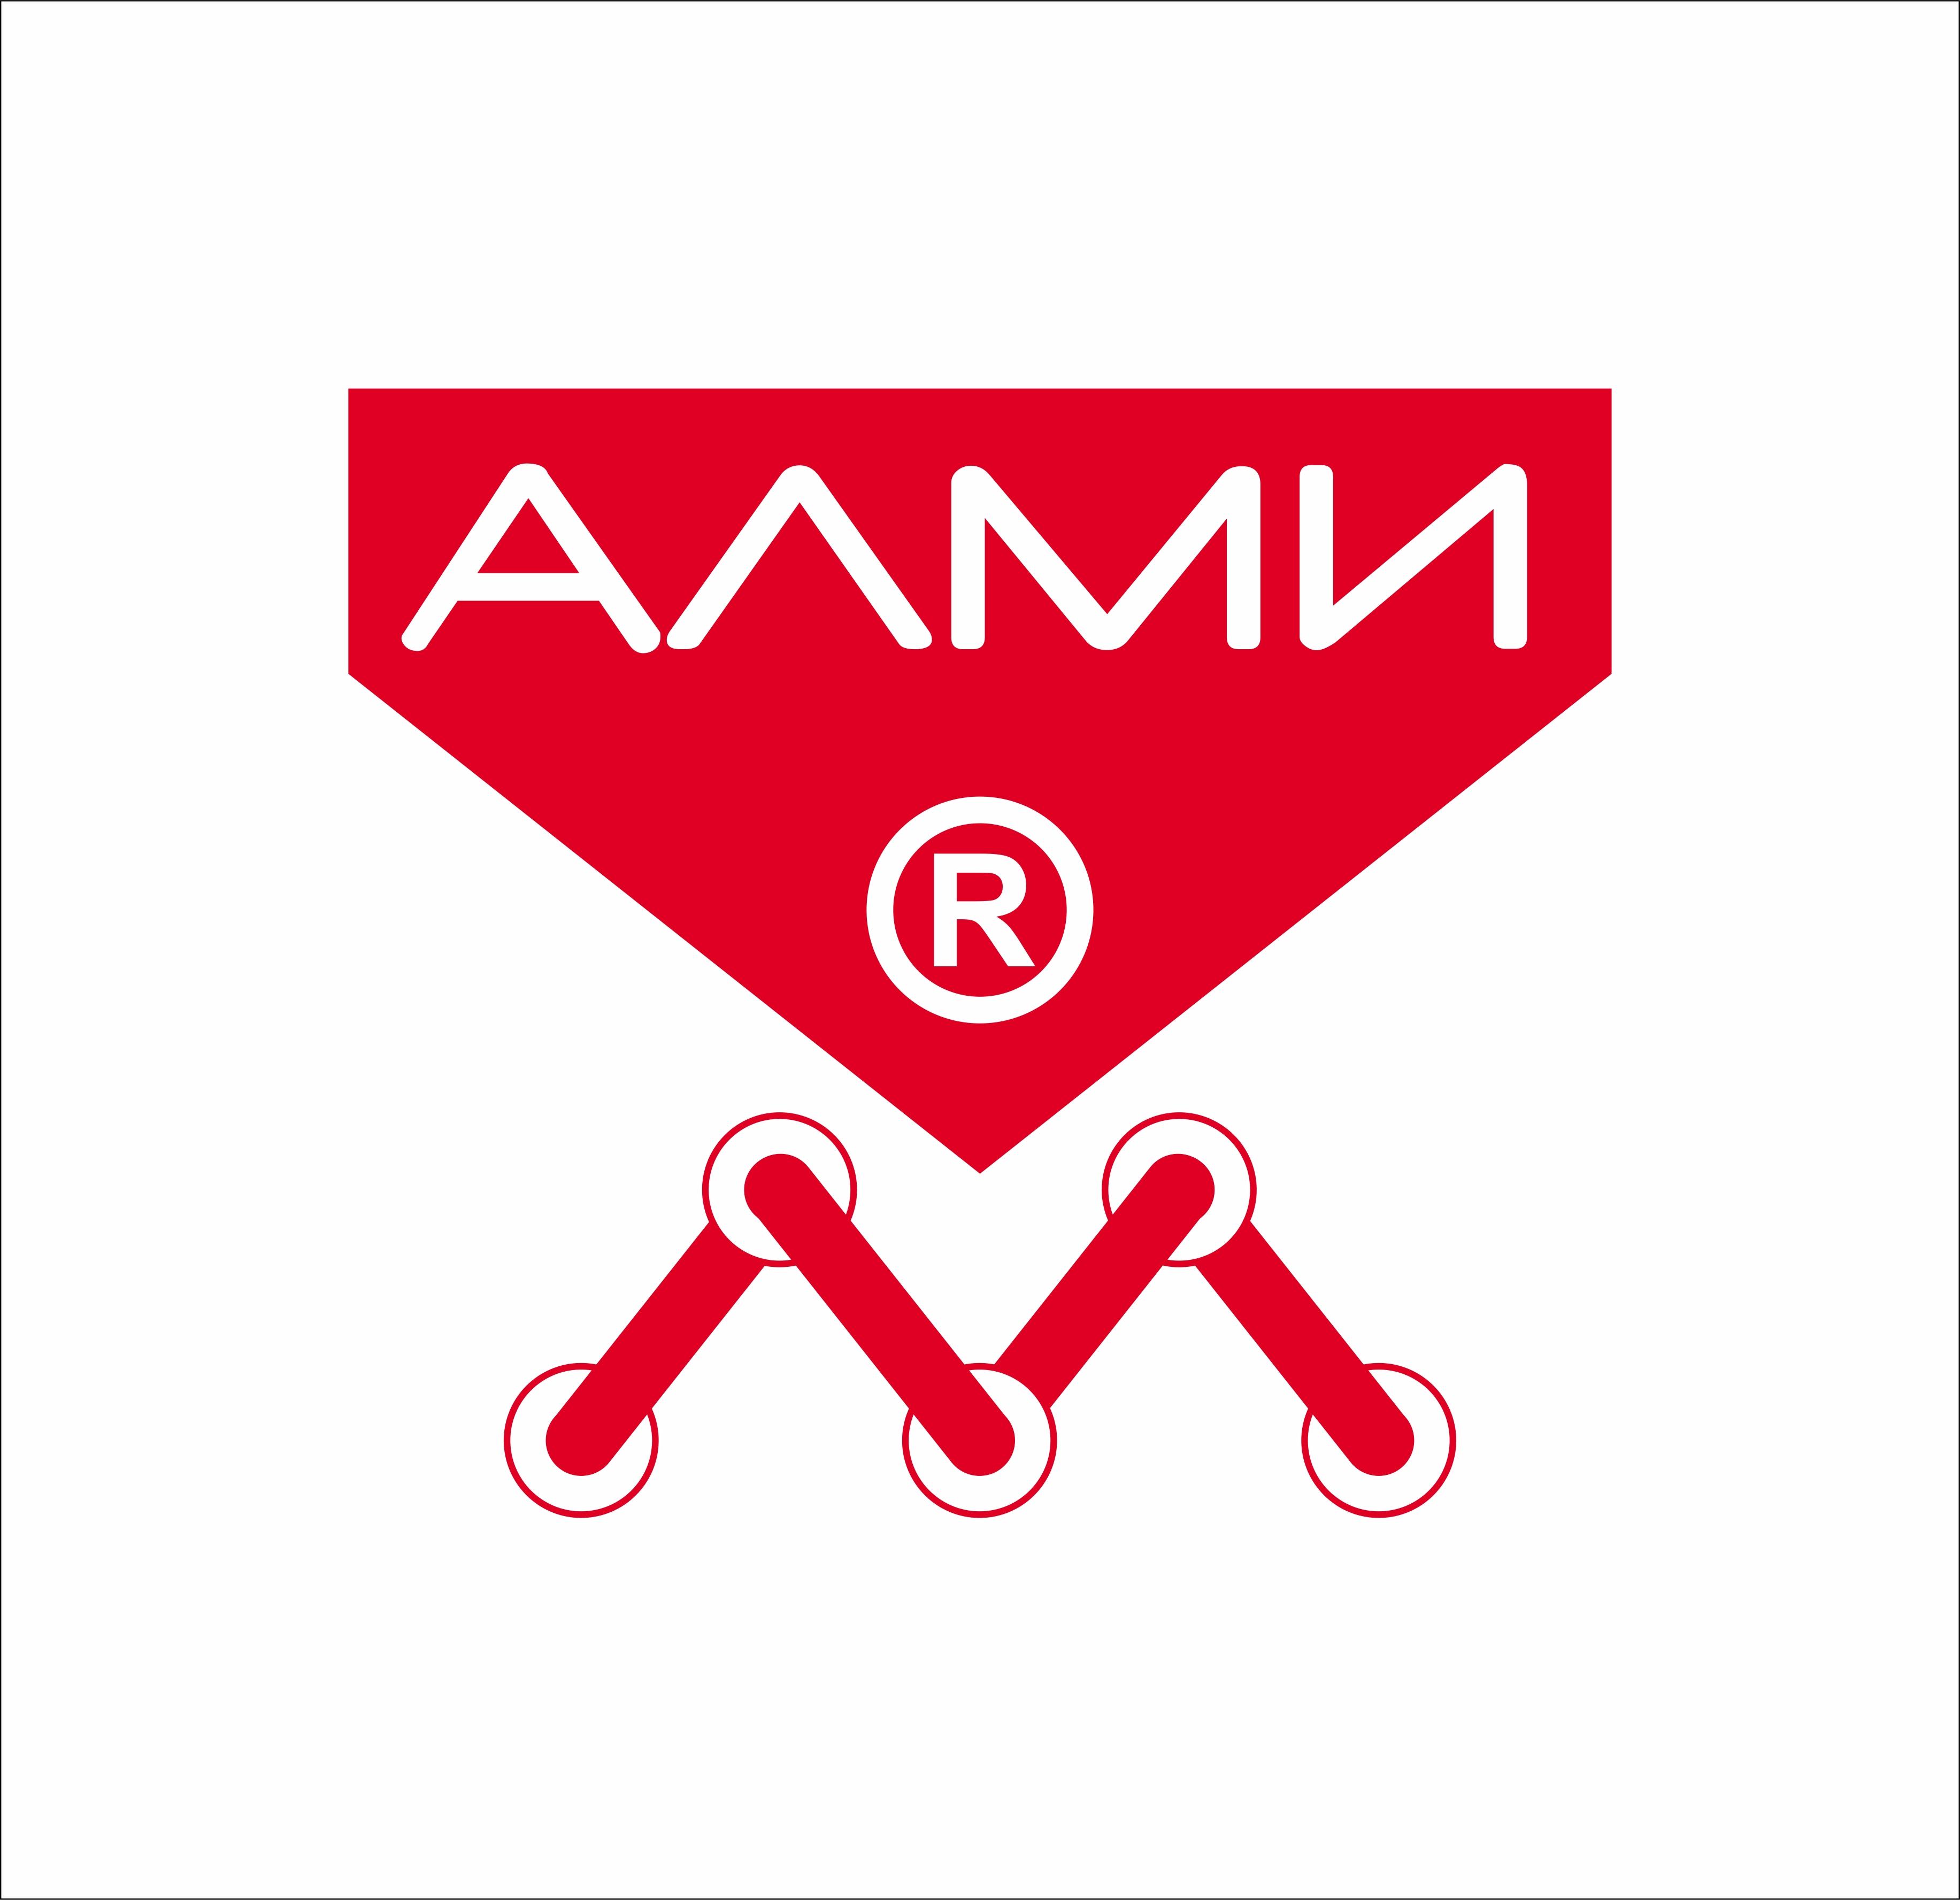 Дизайн логотипа обувной марки Алми фото f_93159ee0128019dc.jpg